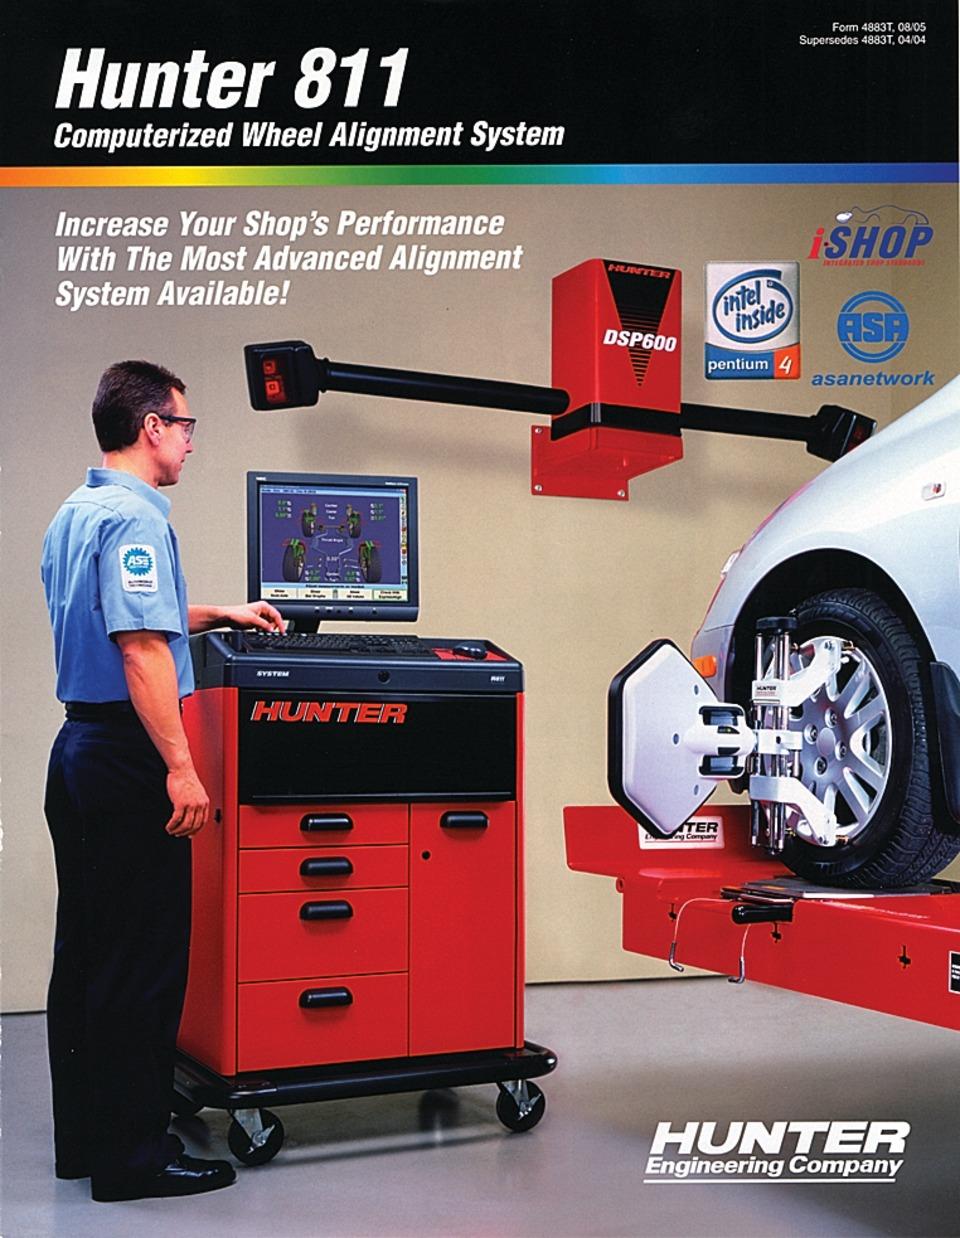 hunter engineering company brochure on hunter 811 system in training rh vehicleservicepros com Hunter DSP600 Software Information Hunter DSP600 Software Information